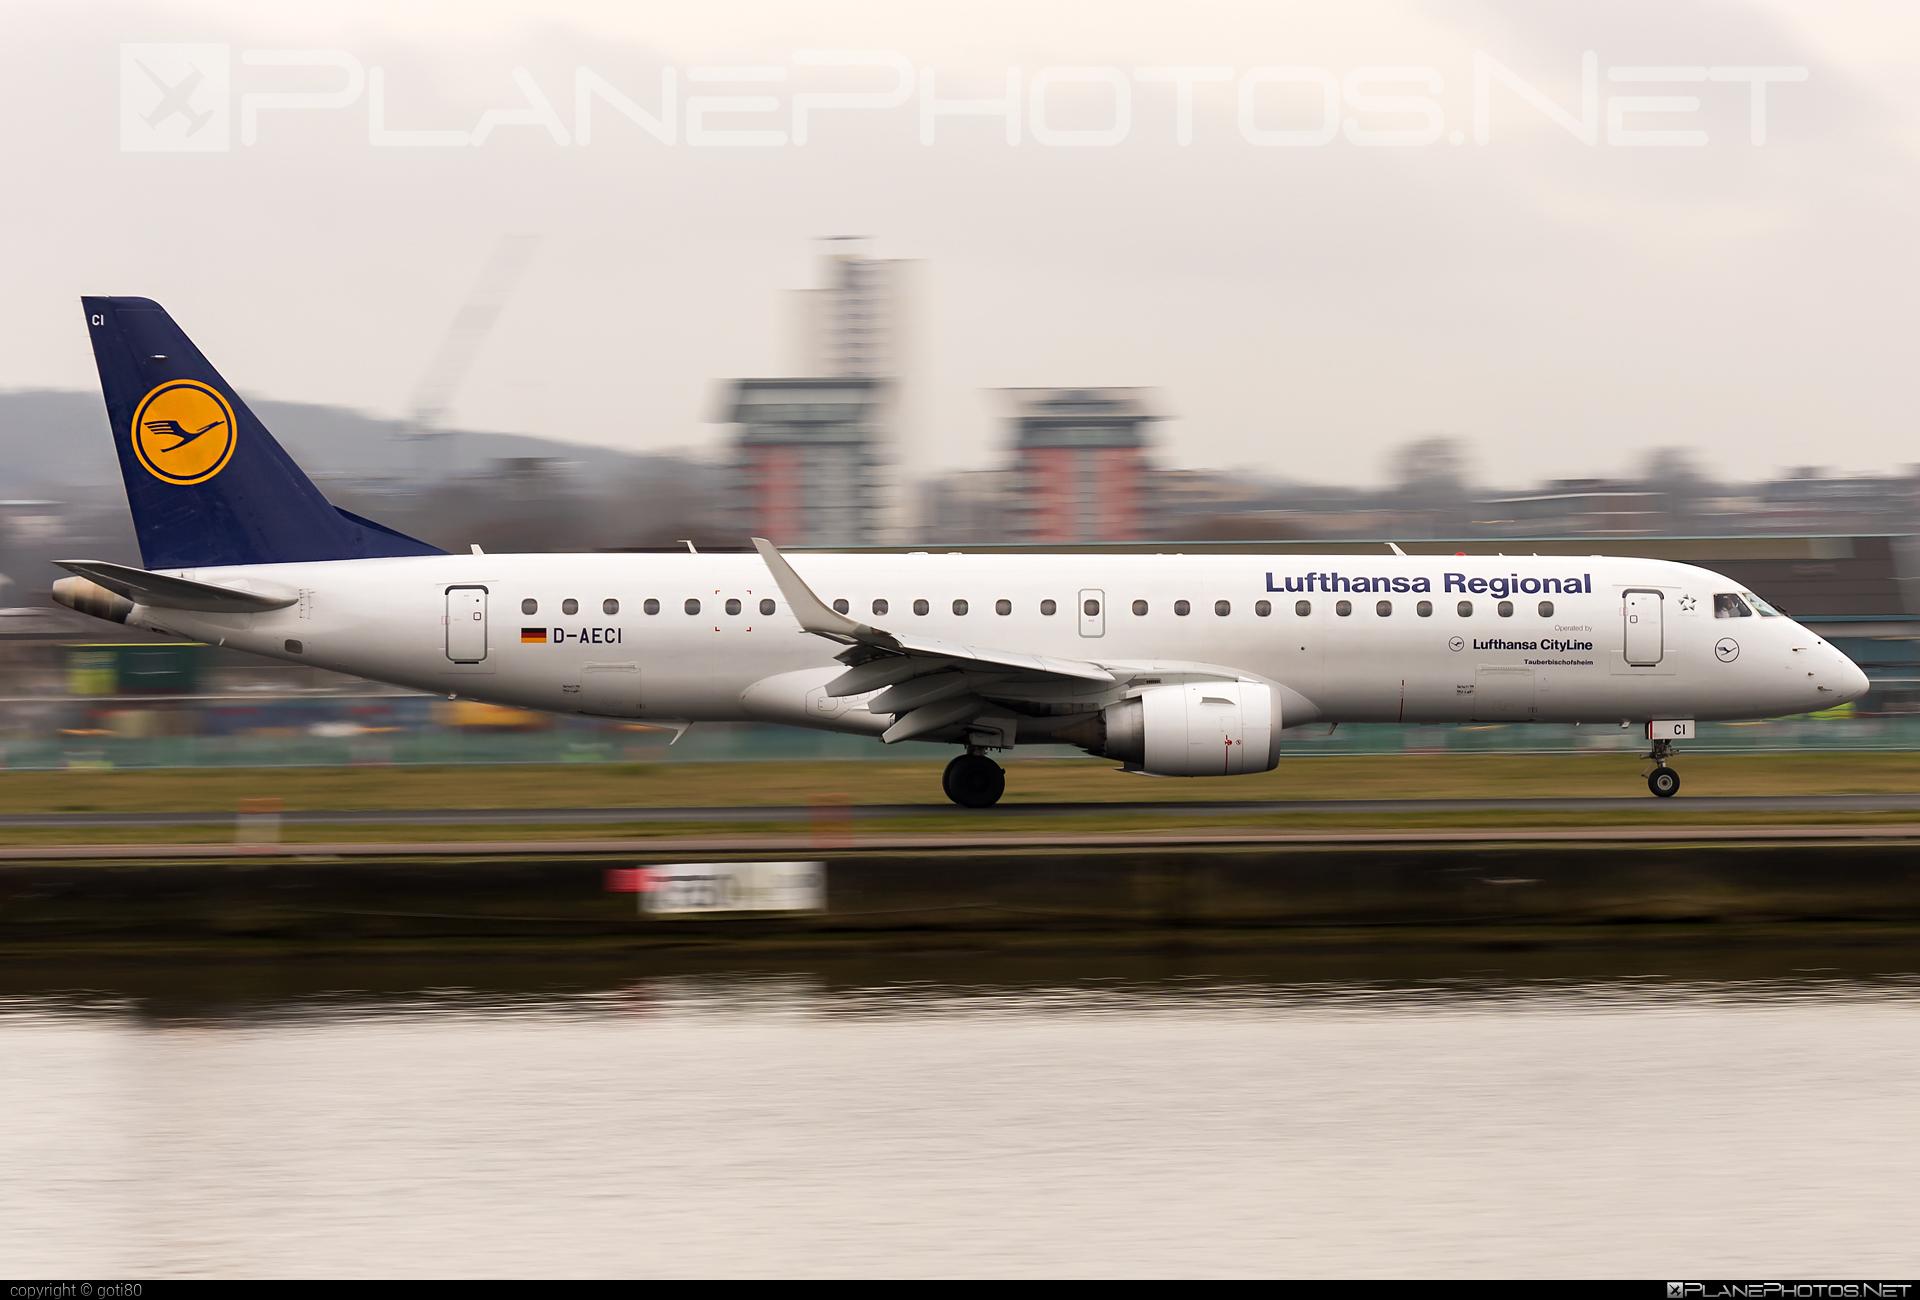 Embraer E190LR (ERJ-190-100LR) - D-AECI operated by Lufthansa Regional (CityLine) #e190 #e190100 #e190100lr #e190lr #embraer #embraer190 #embraer190100lr #embraer190lr